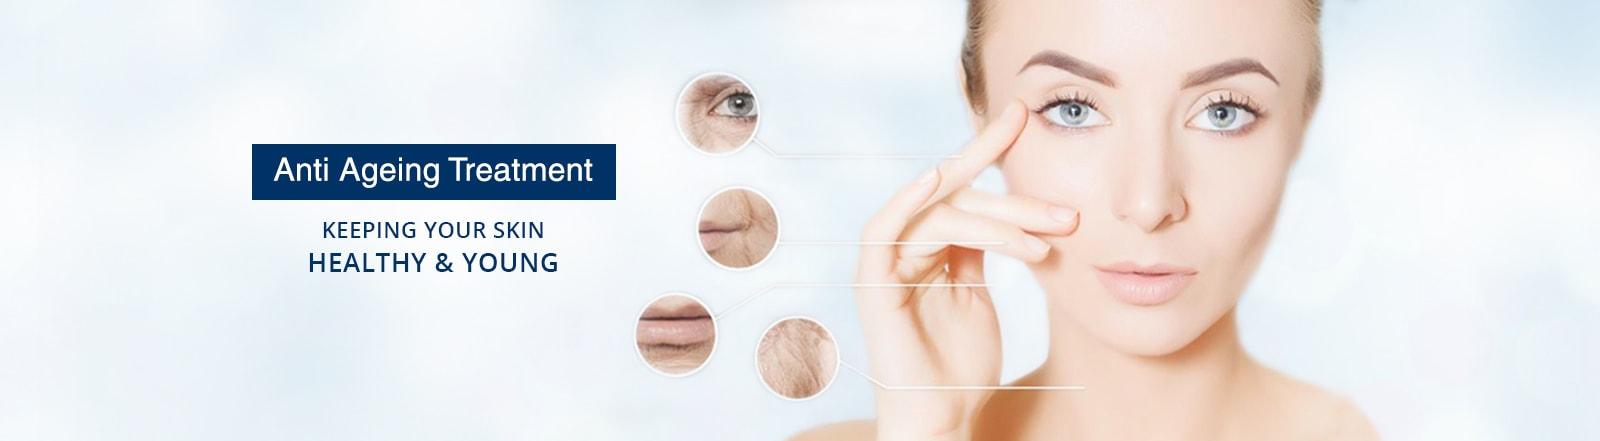 Anti Aging Treatment In South Delhi Facial Rejuvenation Delhi Ncr